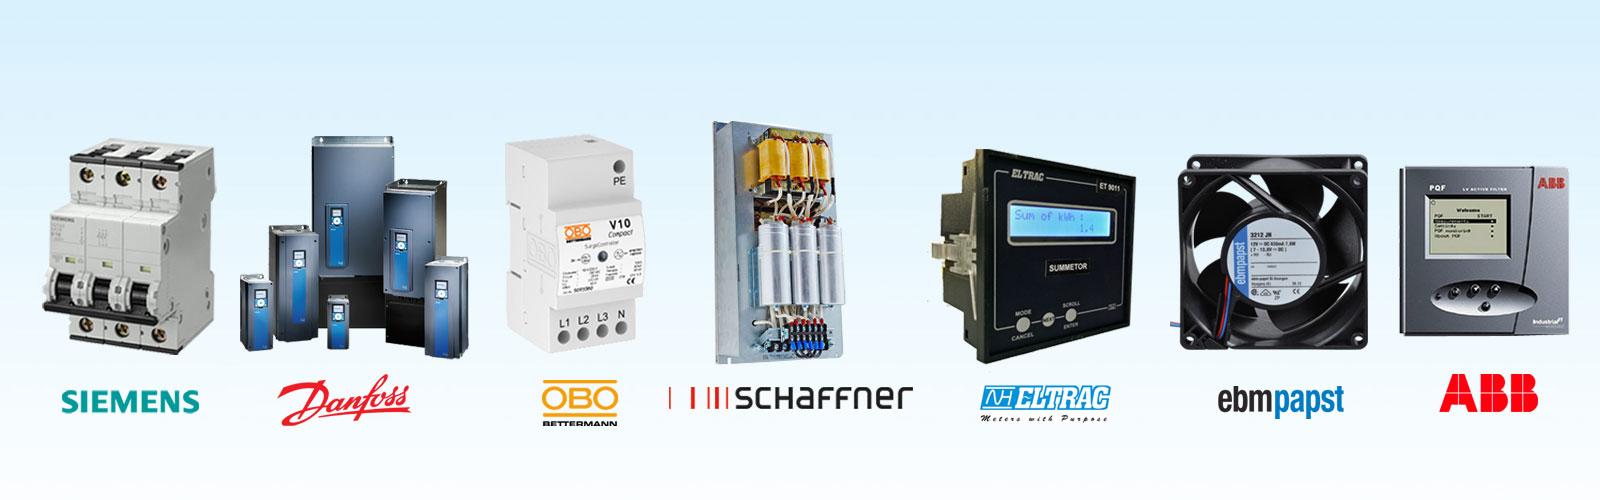 universal_powertech_engineering